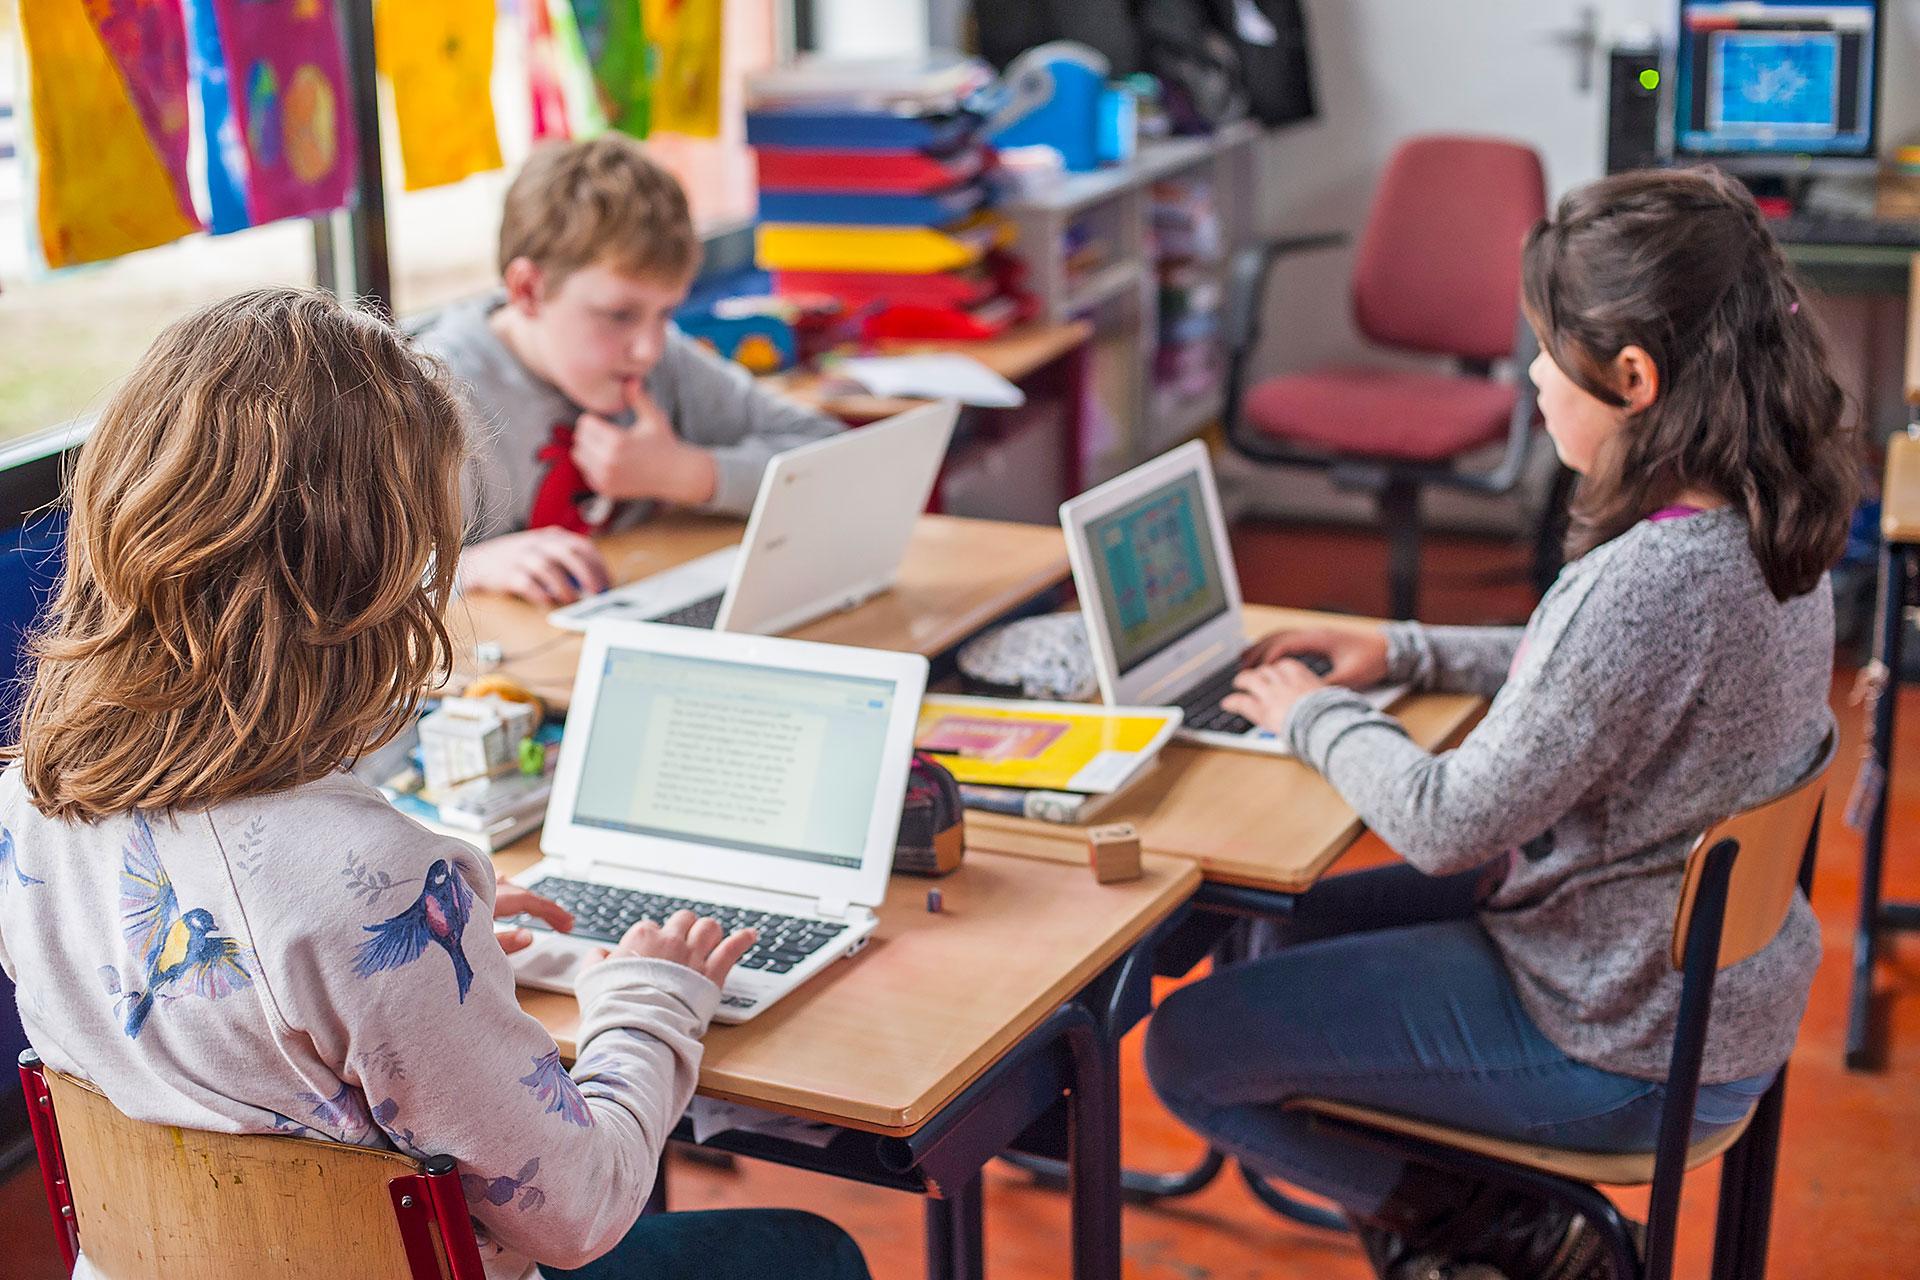 Schüler/innen arbeiten an Laptops im Schulzimmer